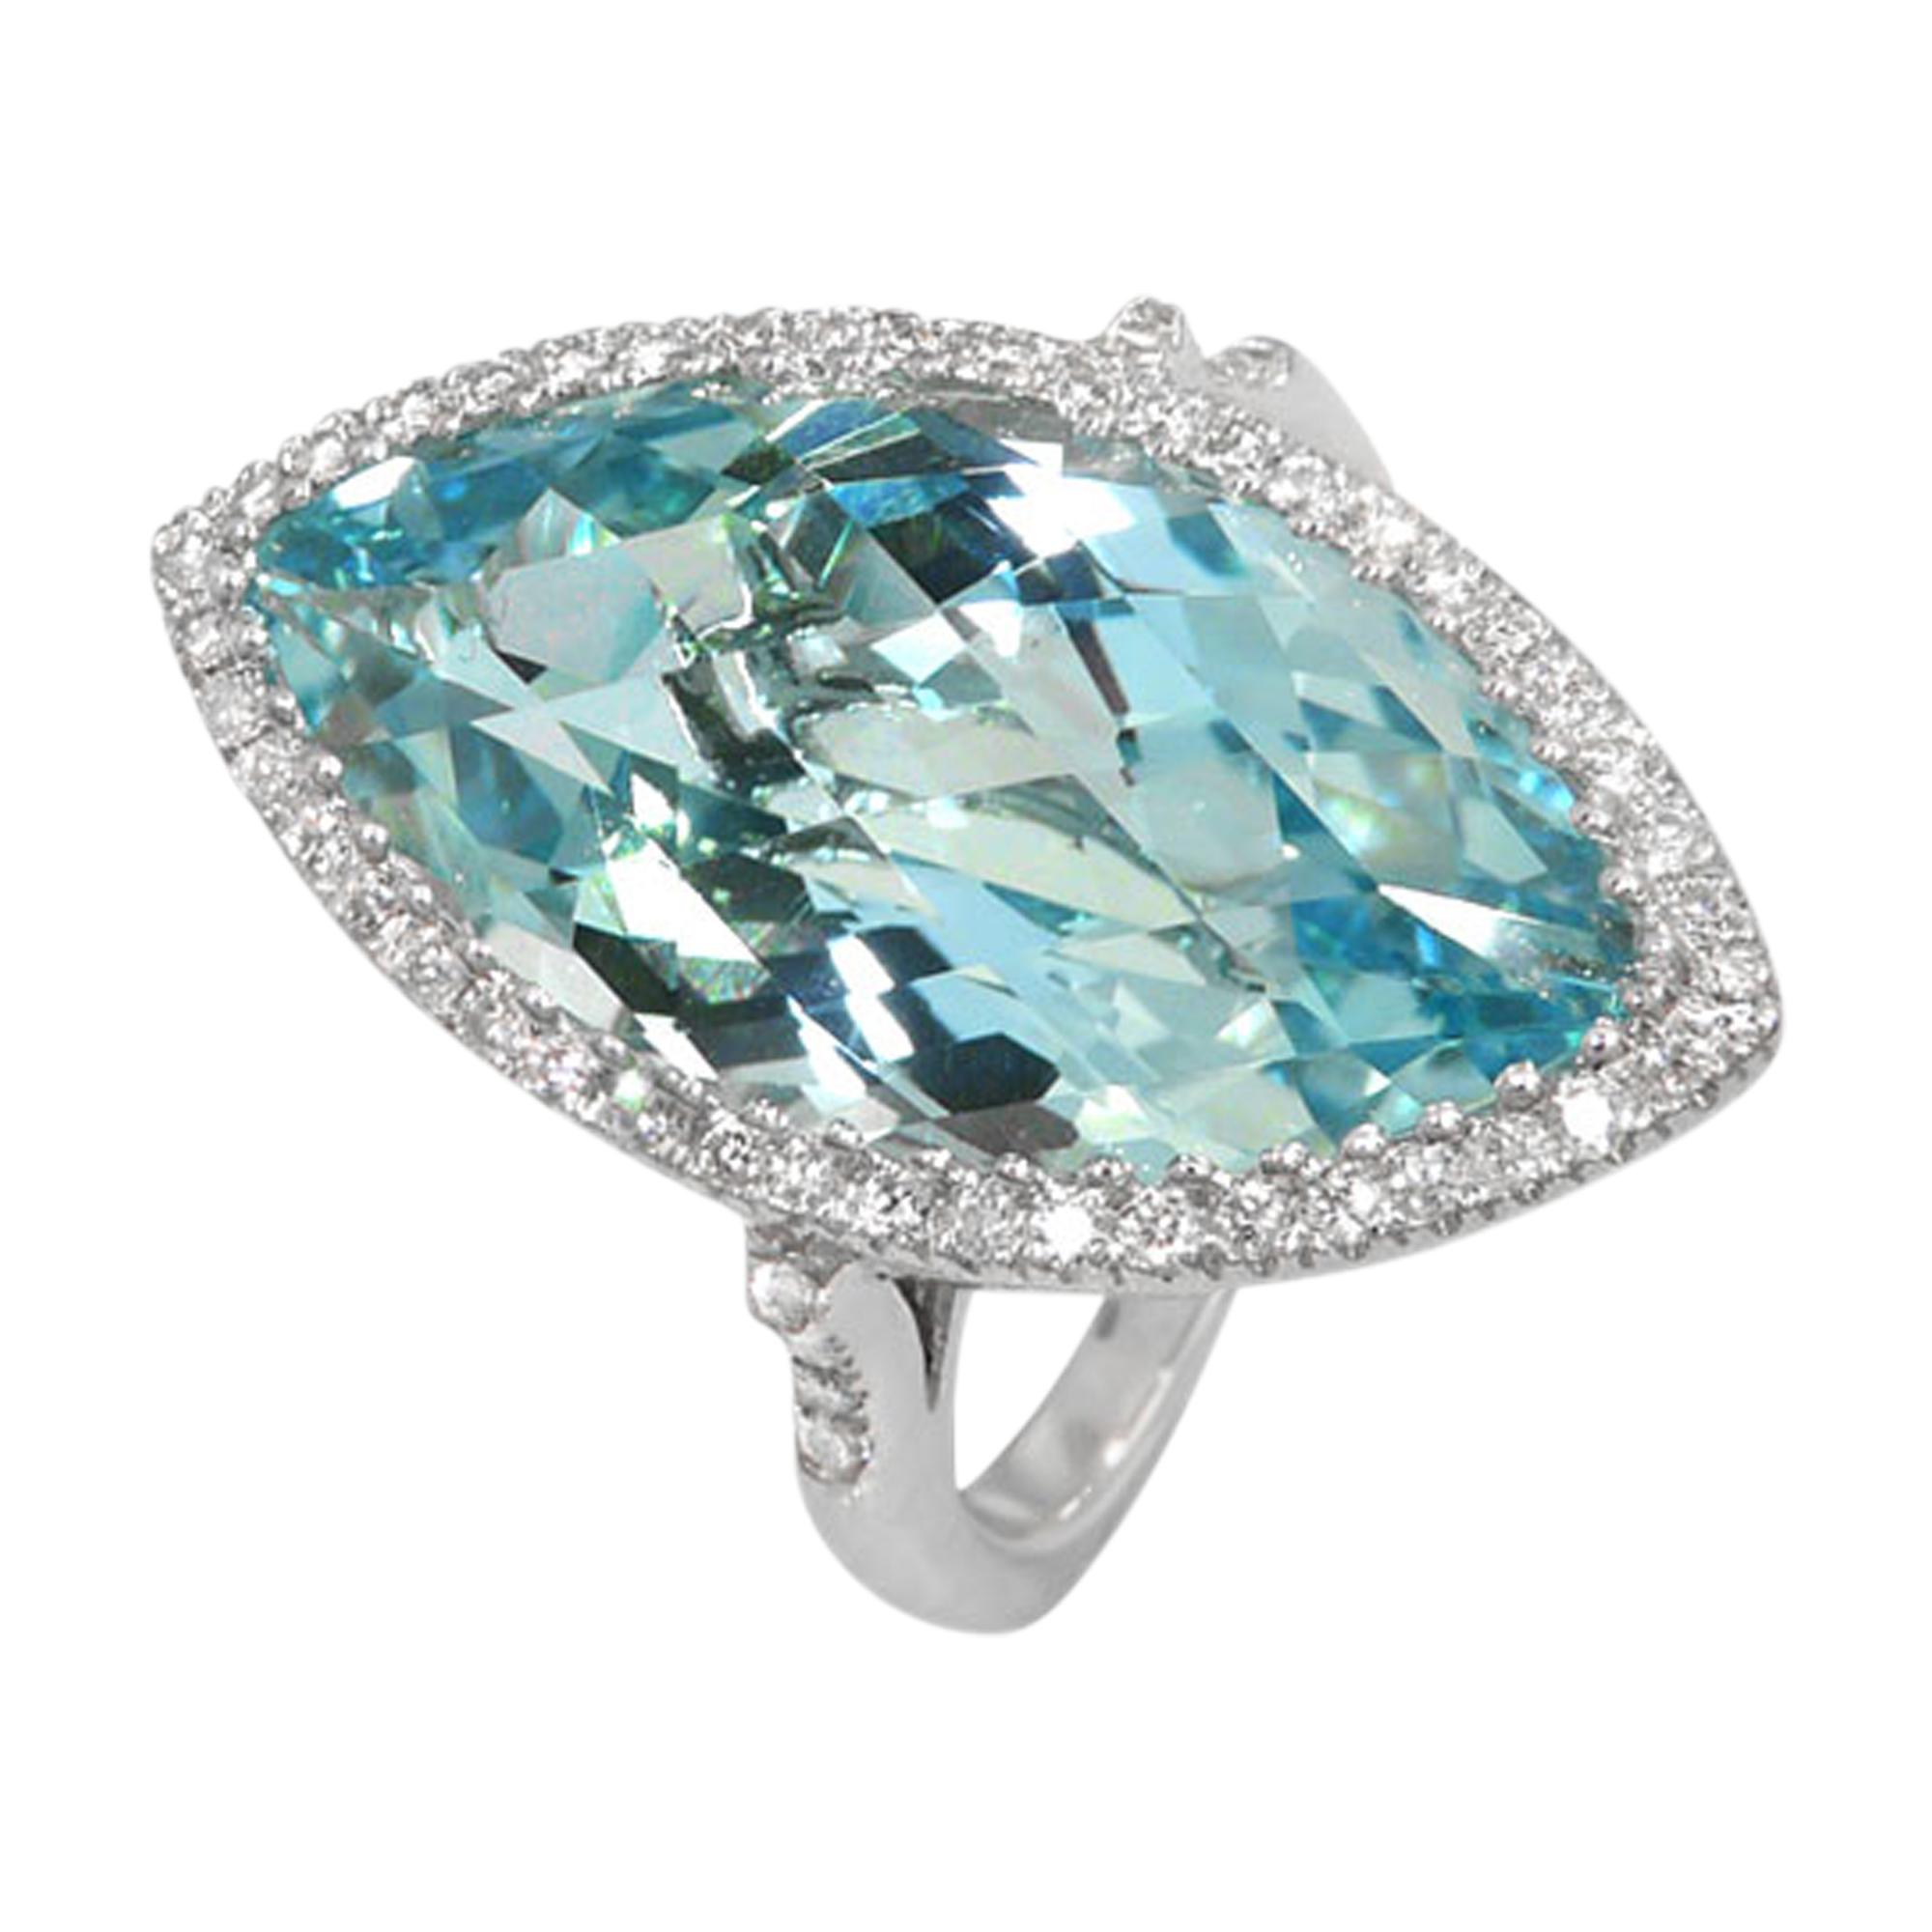 Marquis Checkerboard Cut Blue Topaz & Diamond 18ct White Gold Ring